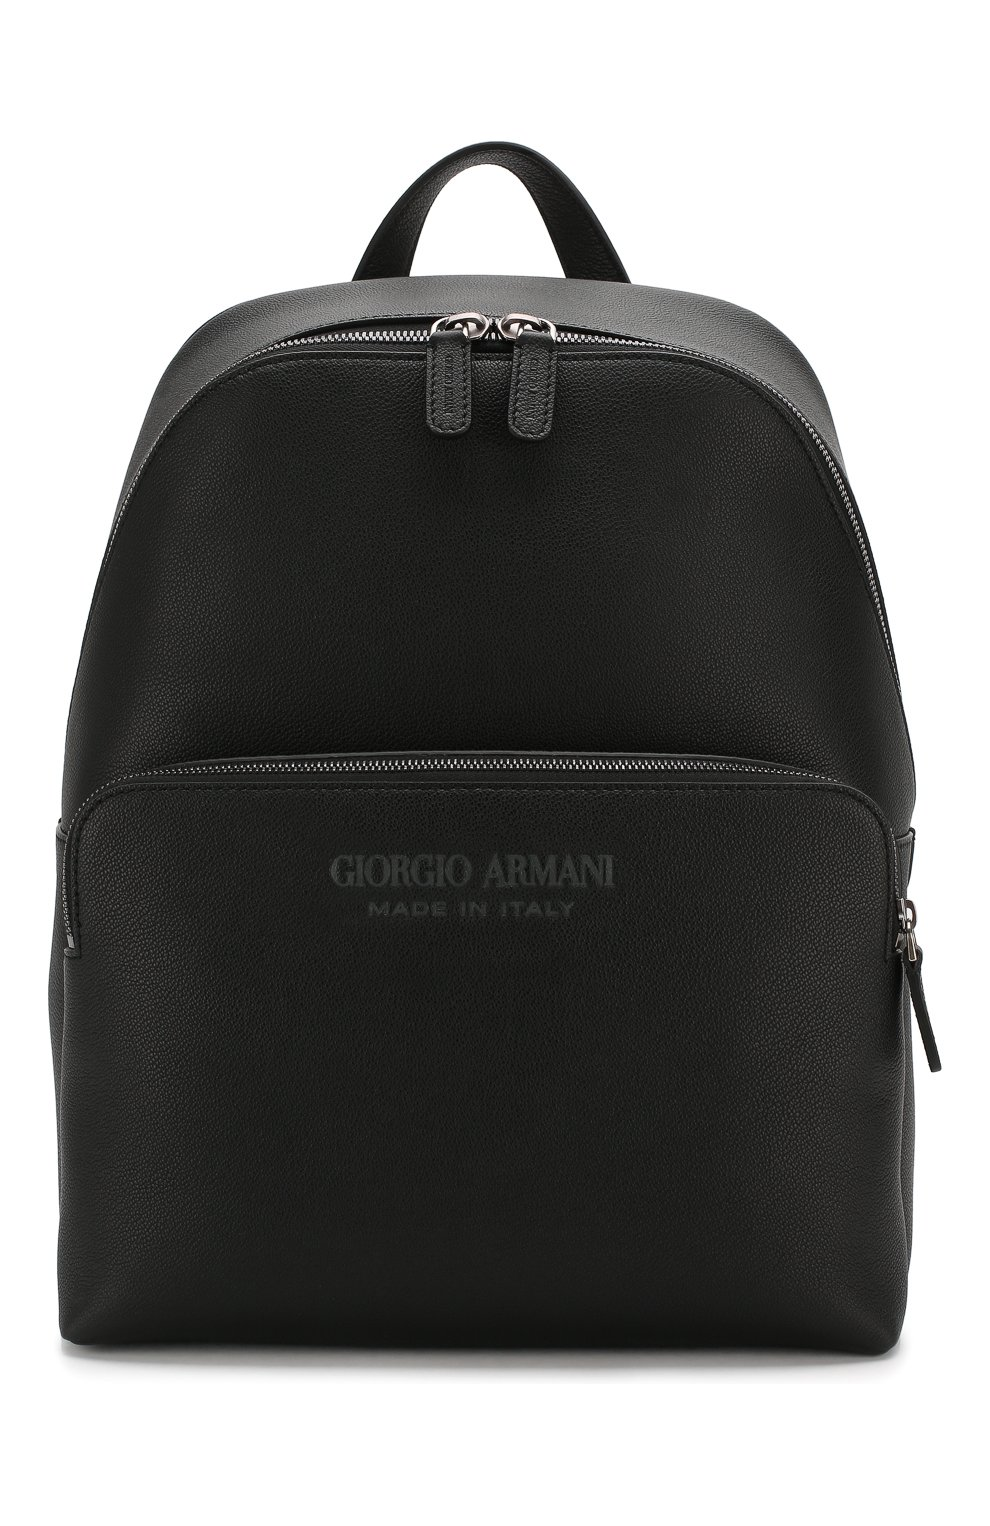 Мужской кожаный рюкзак GIORGIO ARMANI черного цвета, арт. Y20122/YTD0J | Фото 1